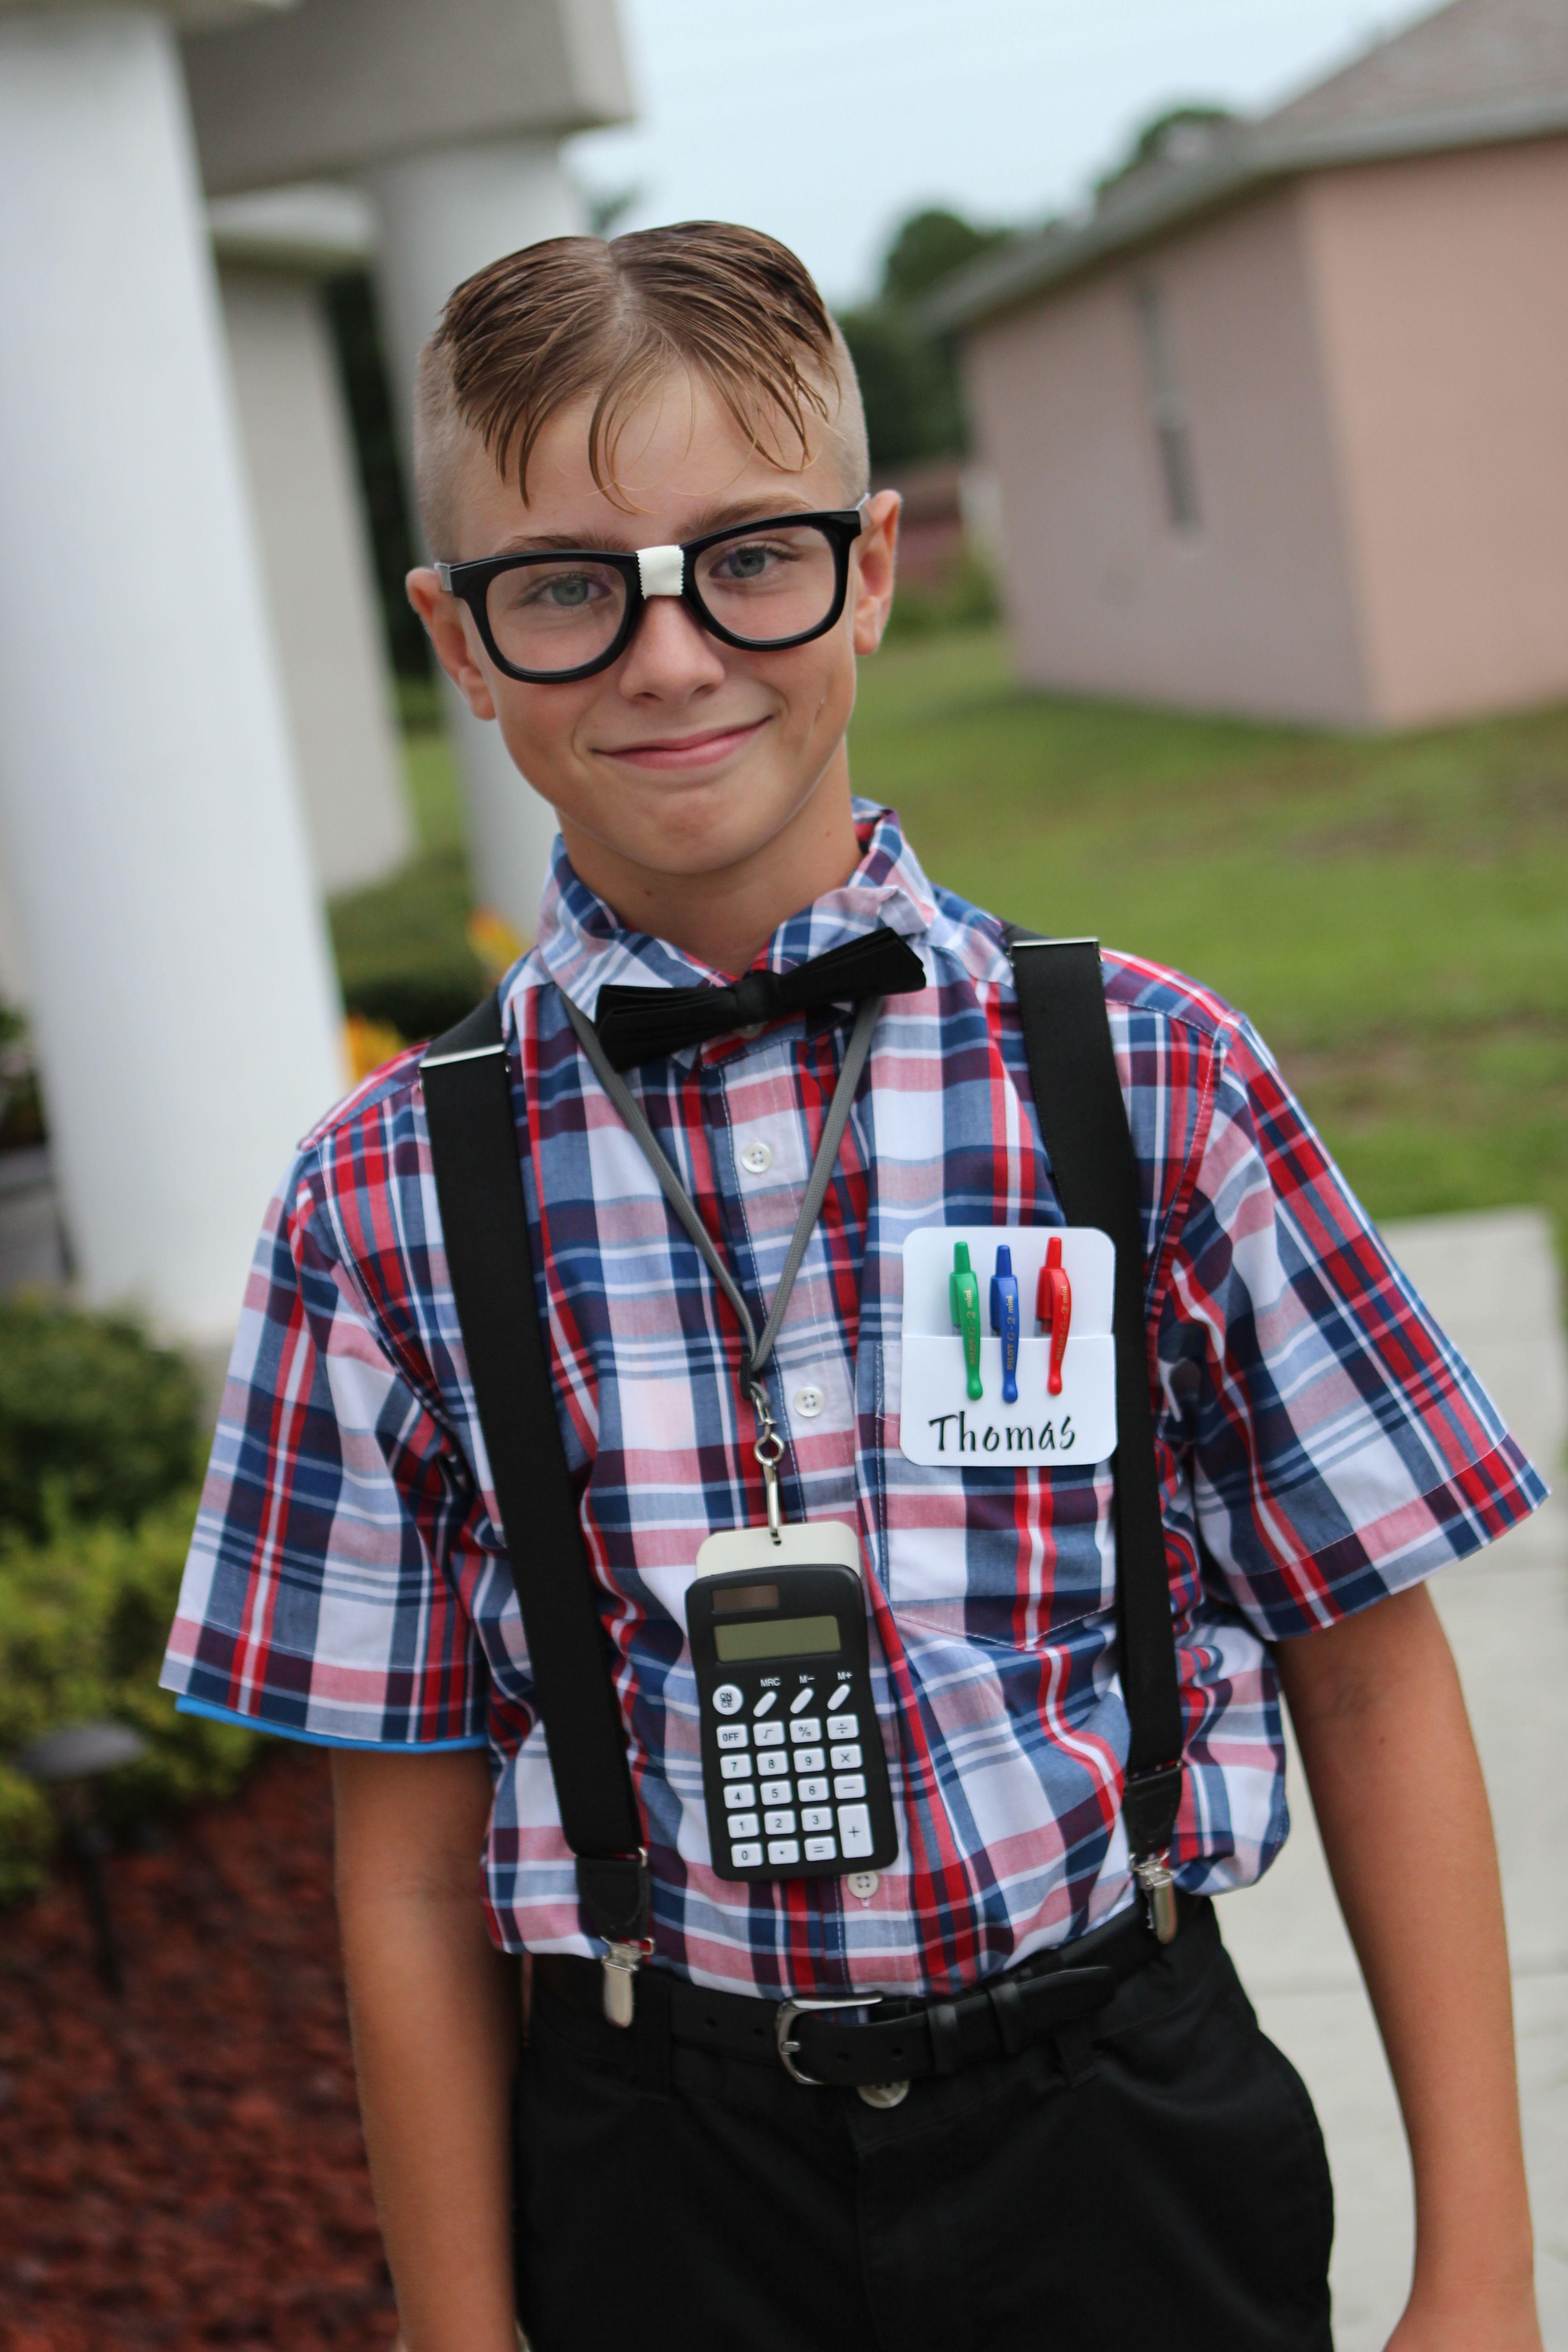 Diy nerd costume hallowee diy nerd costume more solutioingenieria Images